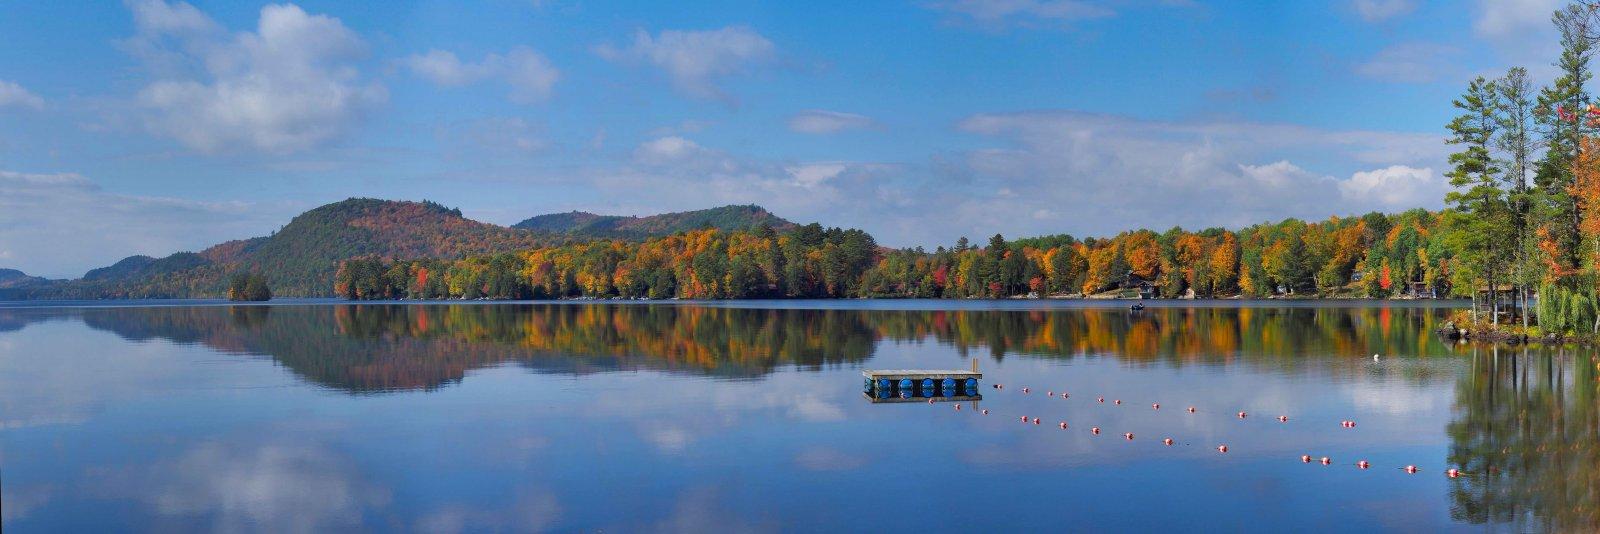 P2-Brant Lake Pano.jpg